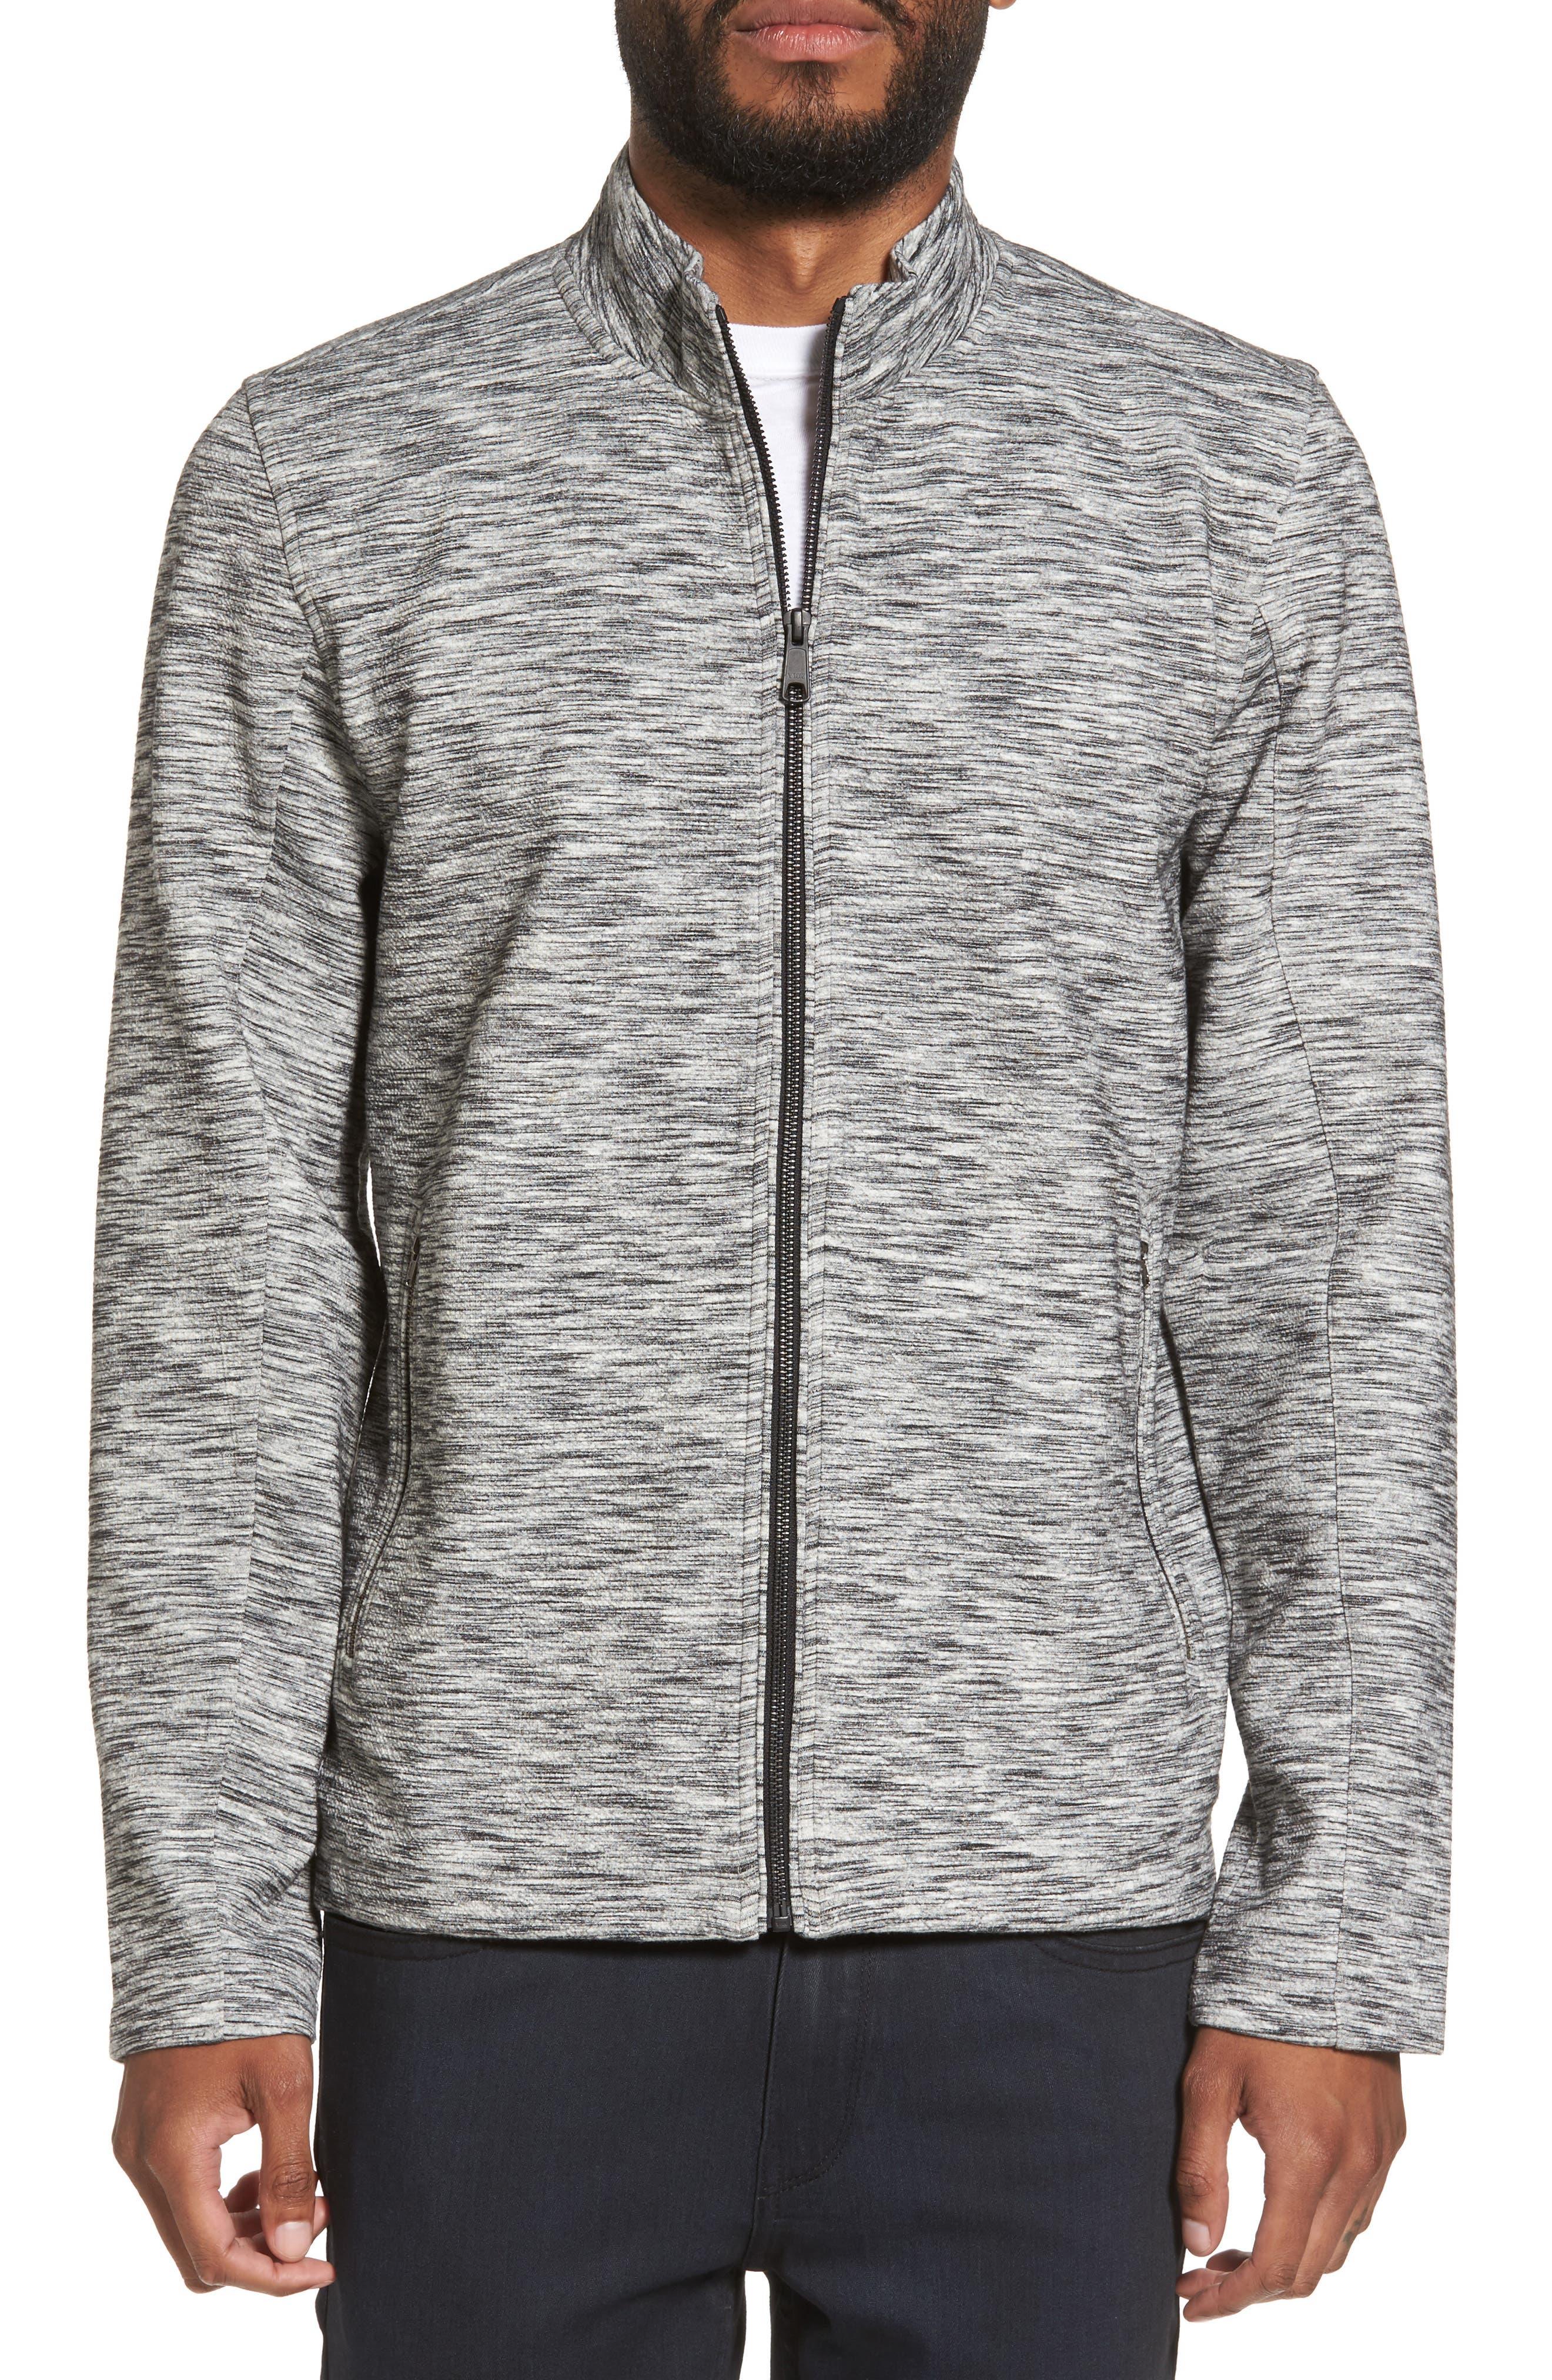 Knit Bomber Jacket,                         Main,                         color, Grey Lunar Spacedye